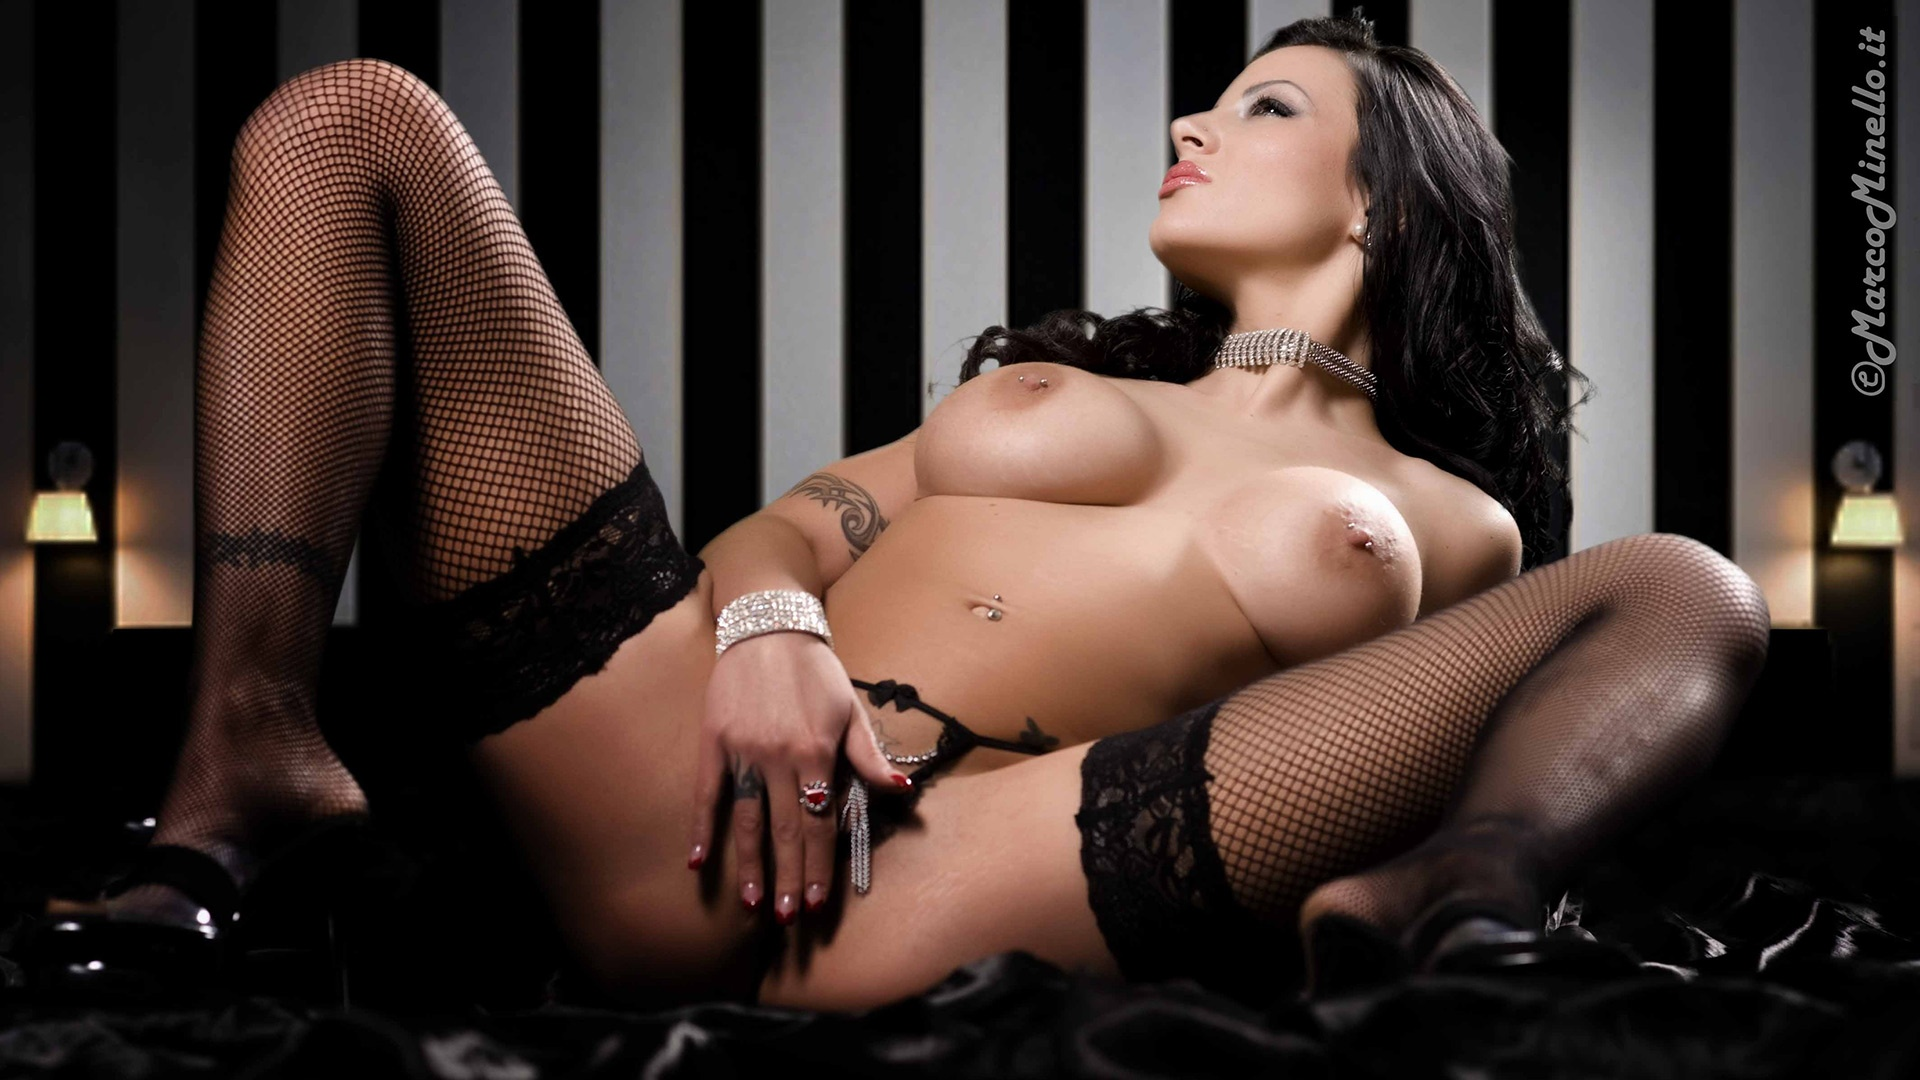 Lingerie porn sexy models congratulate